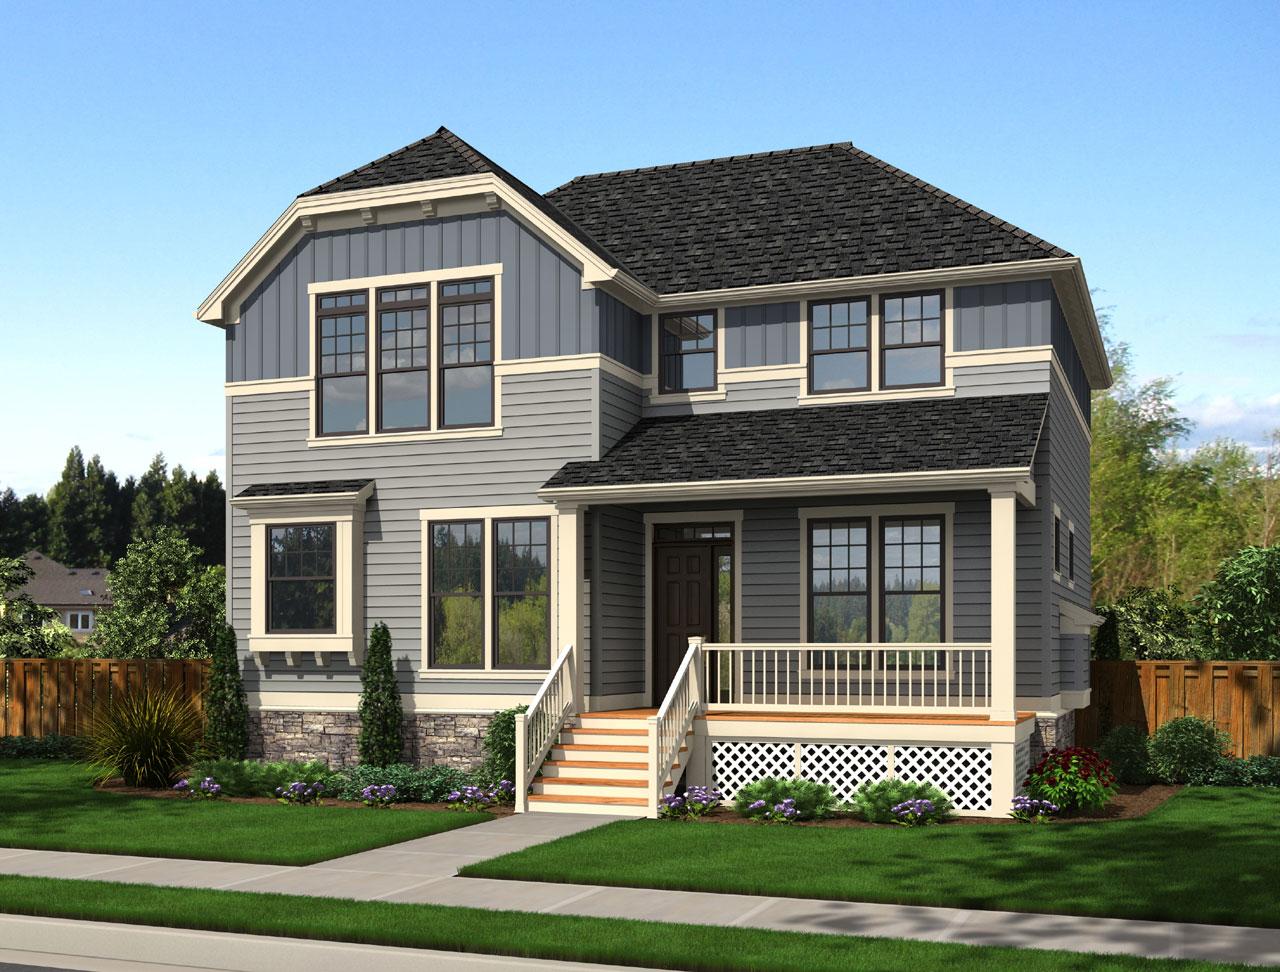 Craftsman Style House Plans Plan: 74-699